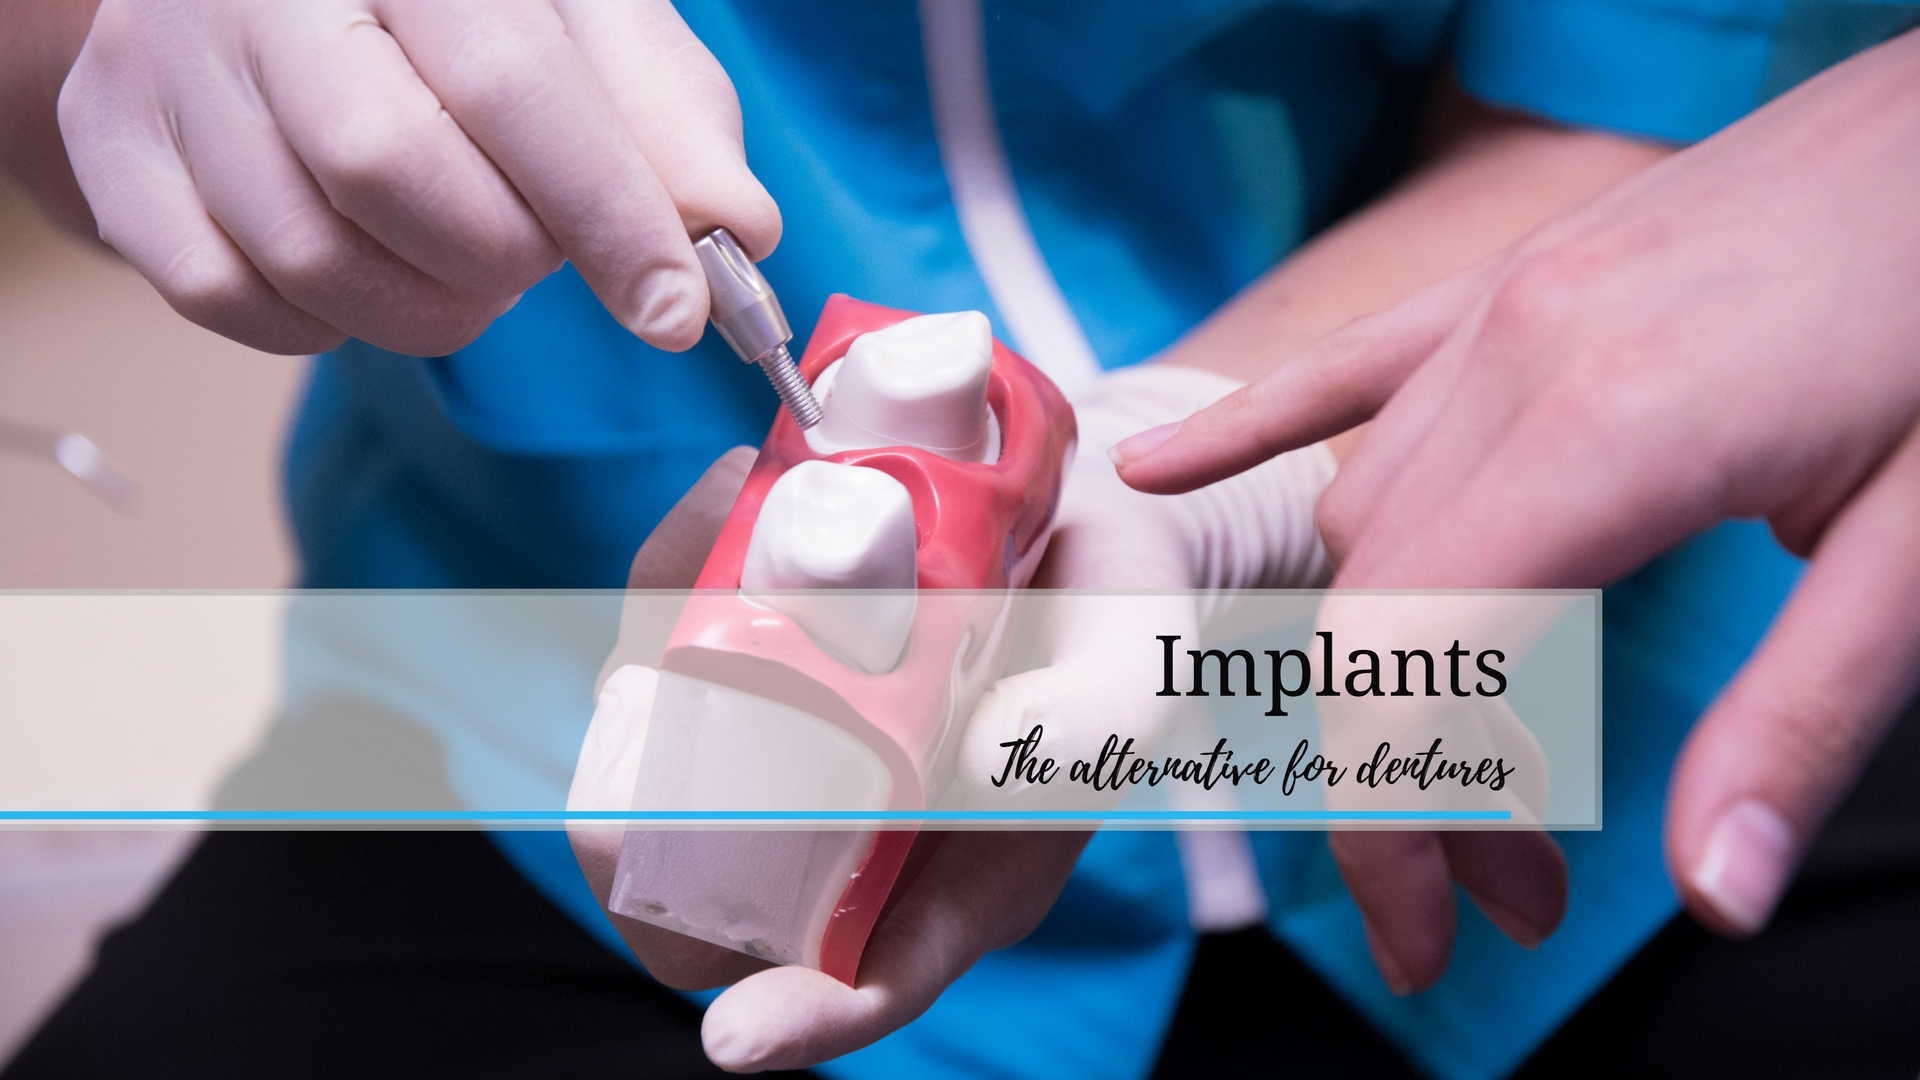 Dr A Rossouw explaining implants